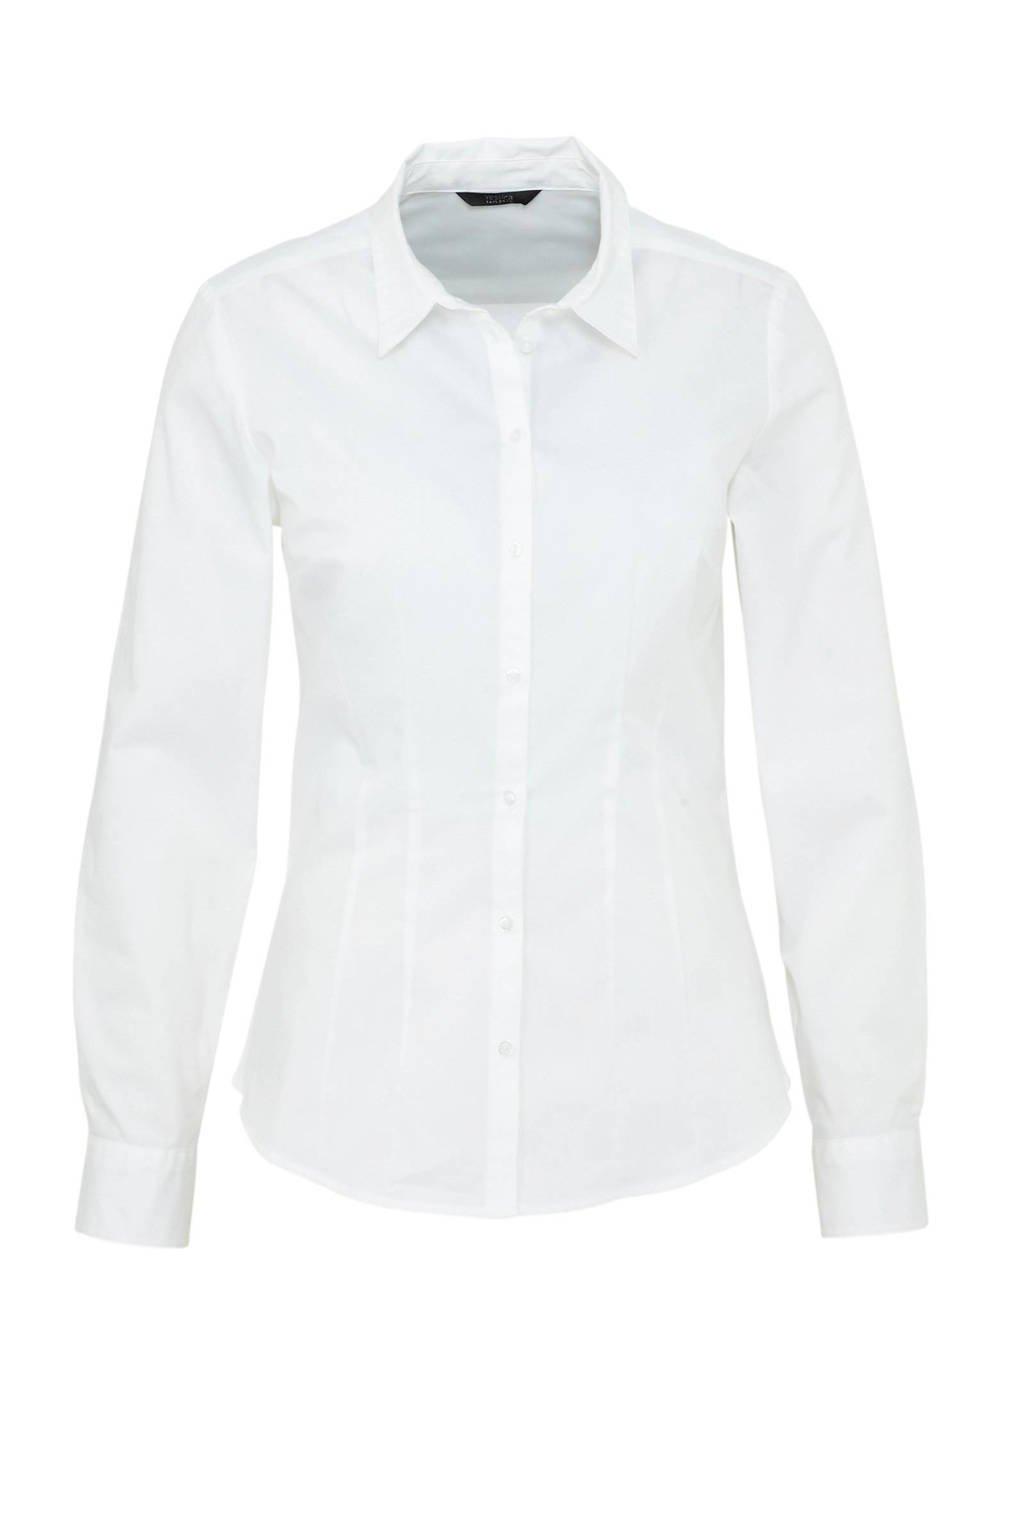 C&A XL Clockhouse blouse off white, Off White